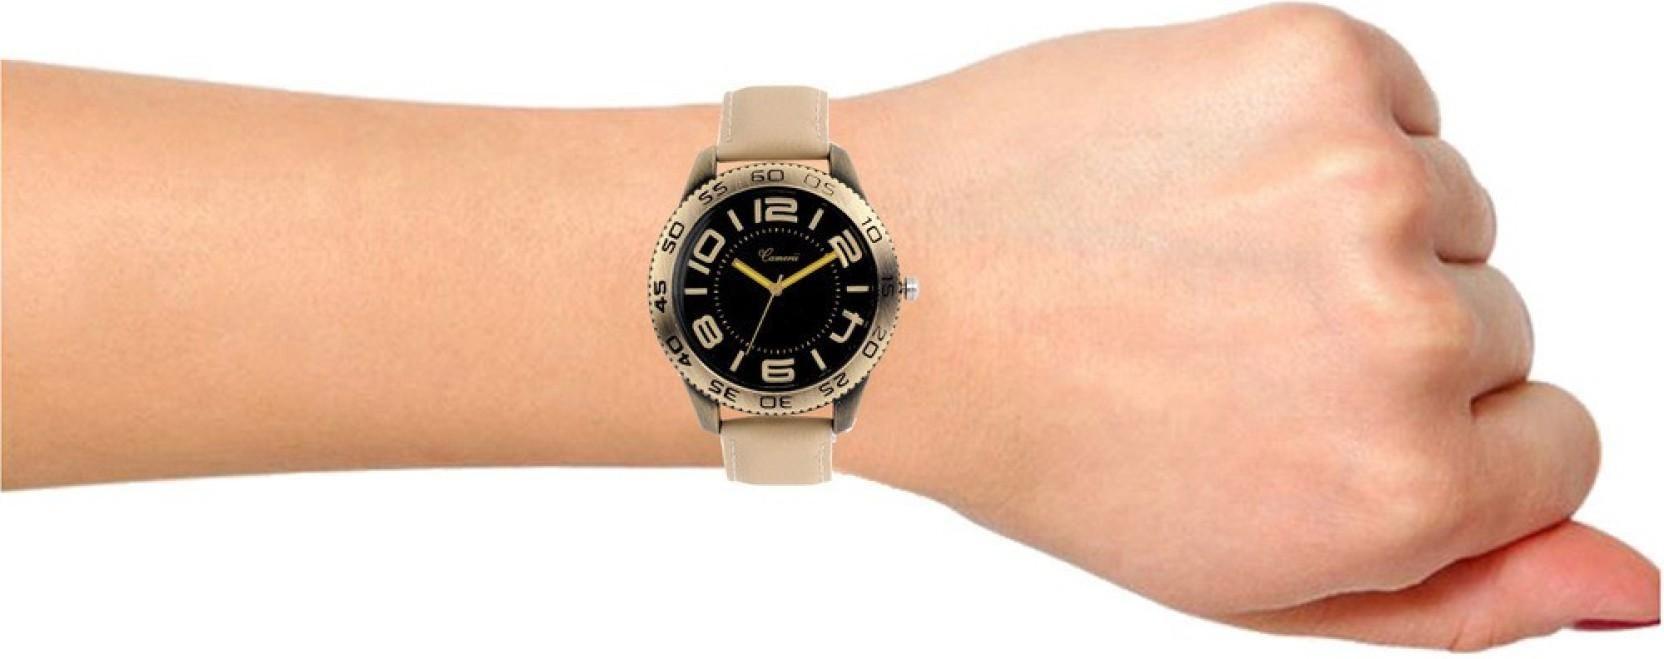 Camerii WM134 Watch - For Men